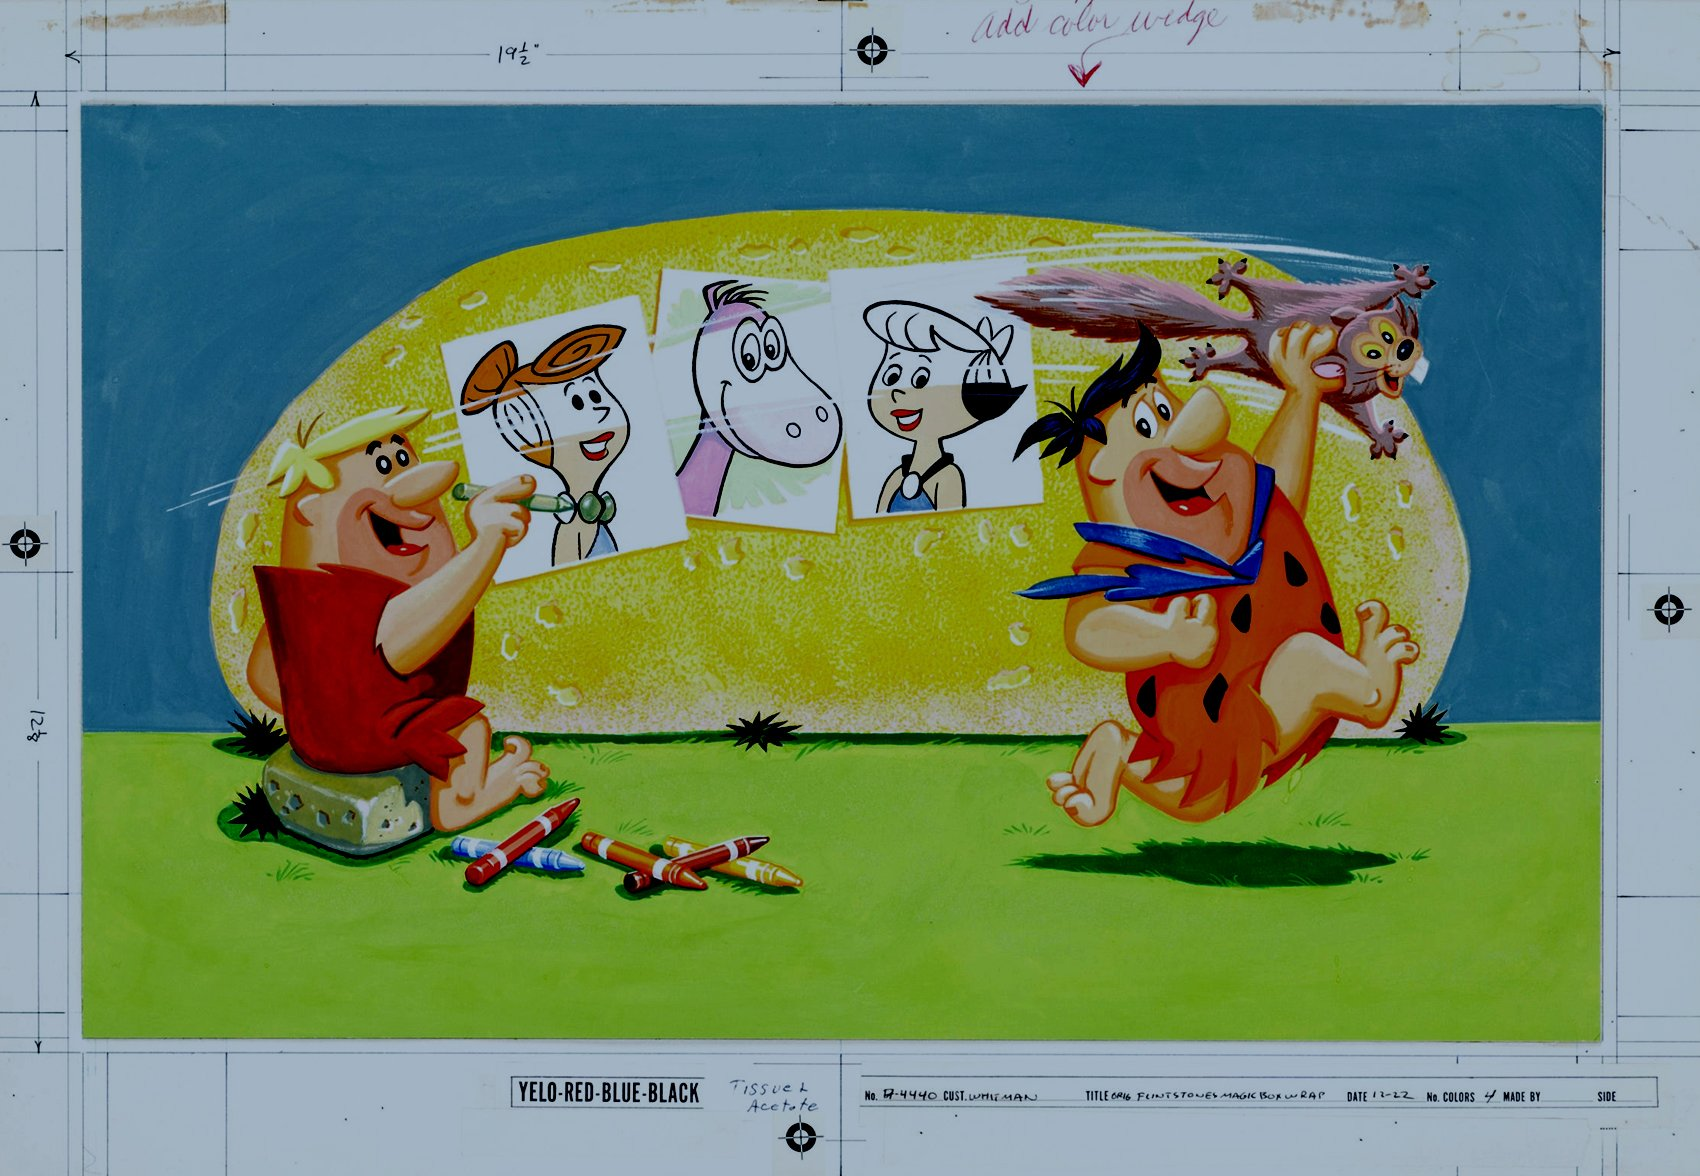 Flintstones Magic Rub-Off Pictures Box Cover Painting (Large Art - 1962)